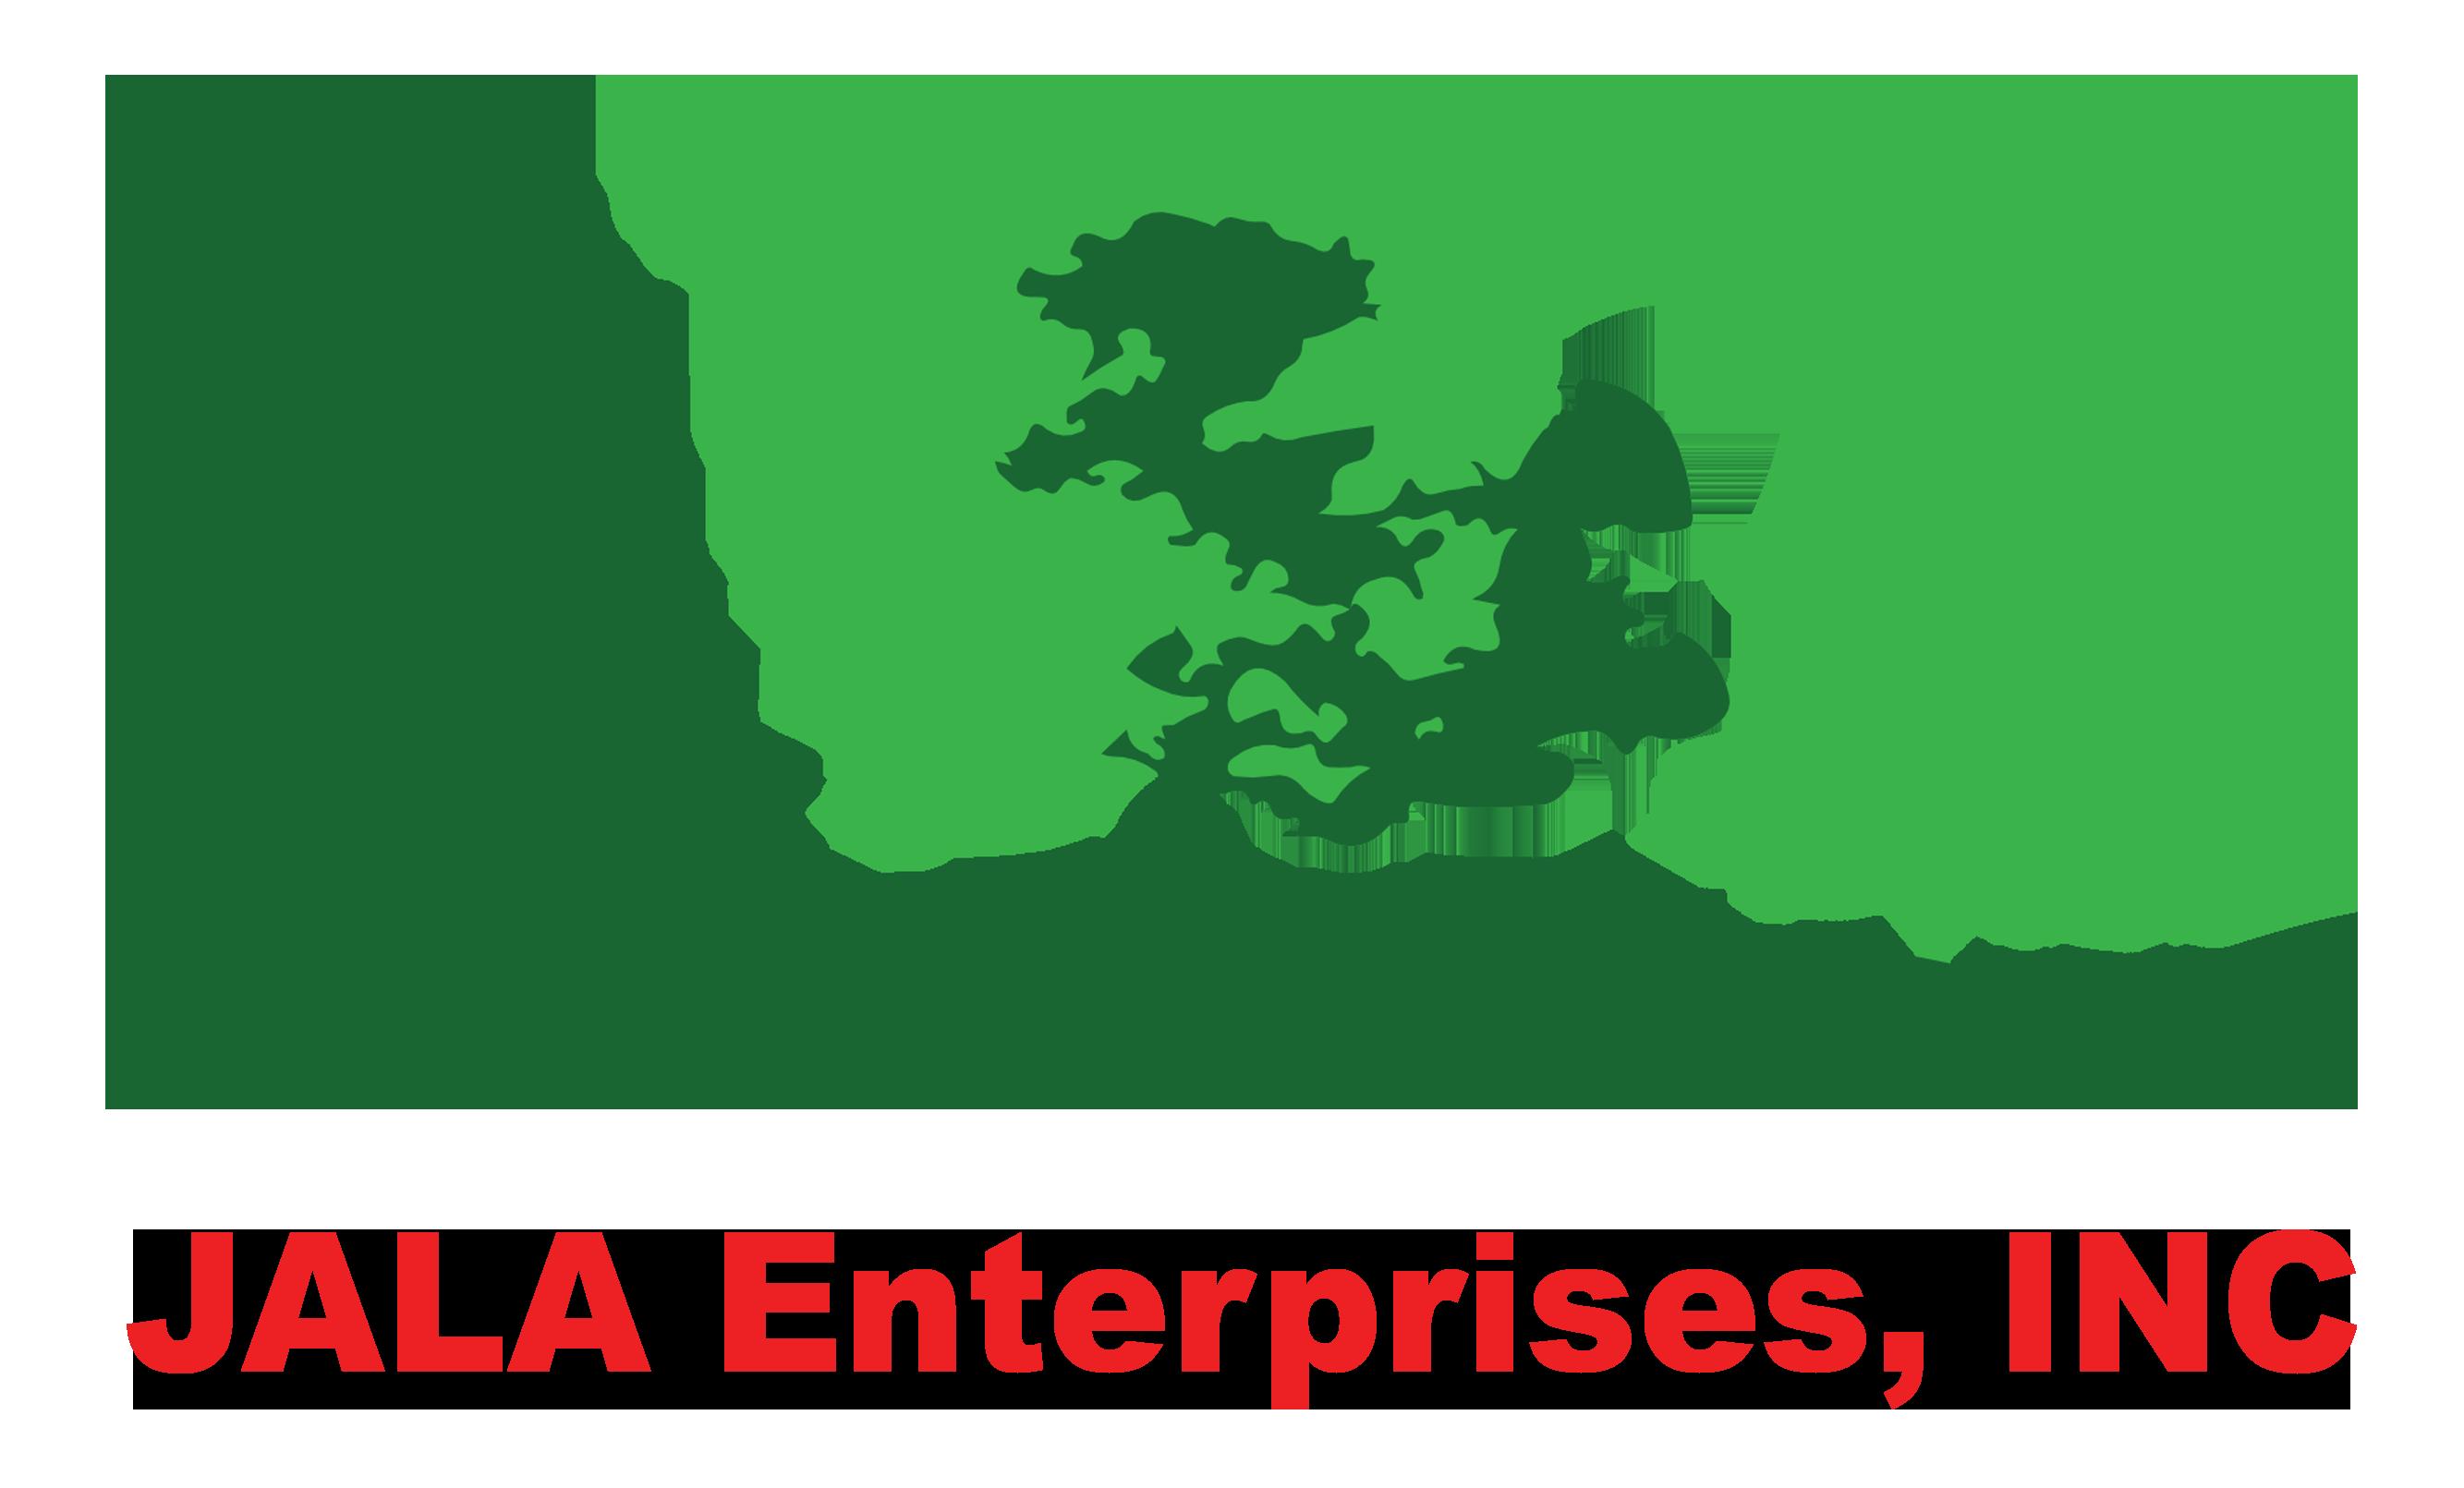 Jala Enterprises, Inc